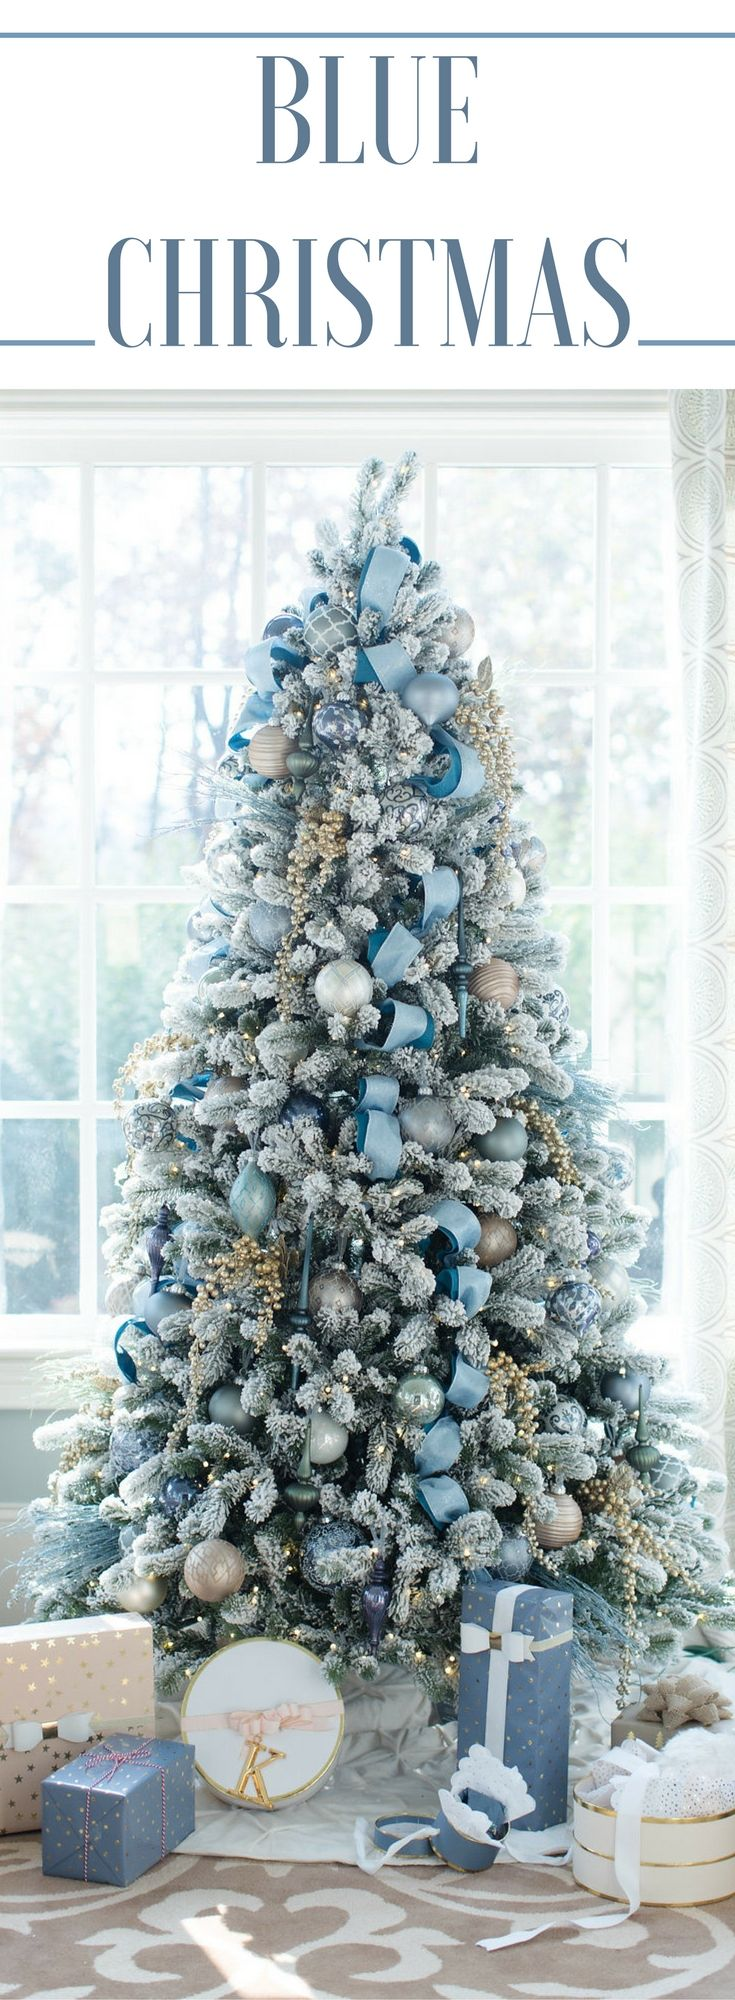 Best 25+ Blue christmas decor ideas on Pinterest | Blue ...